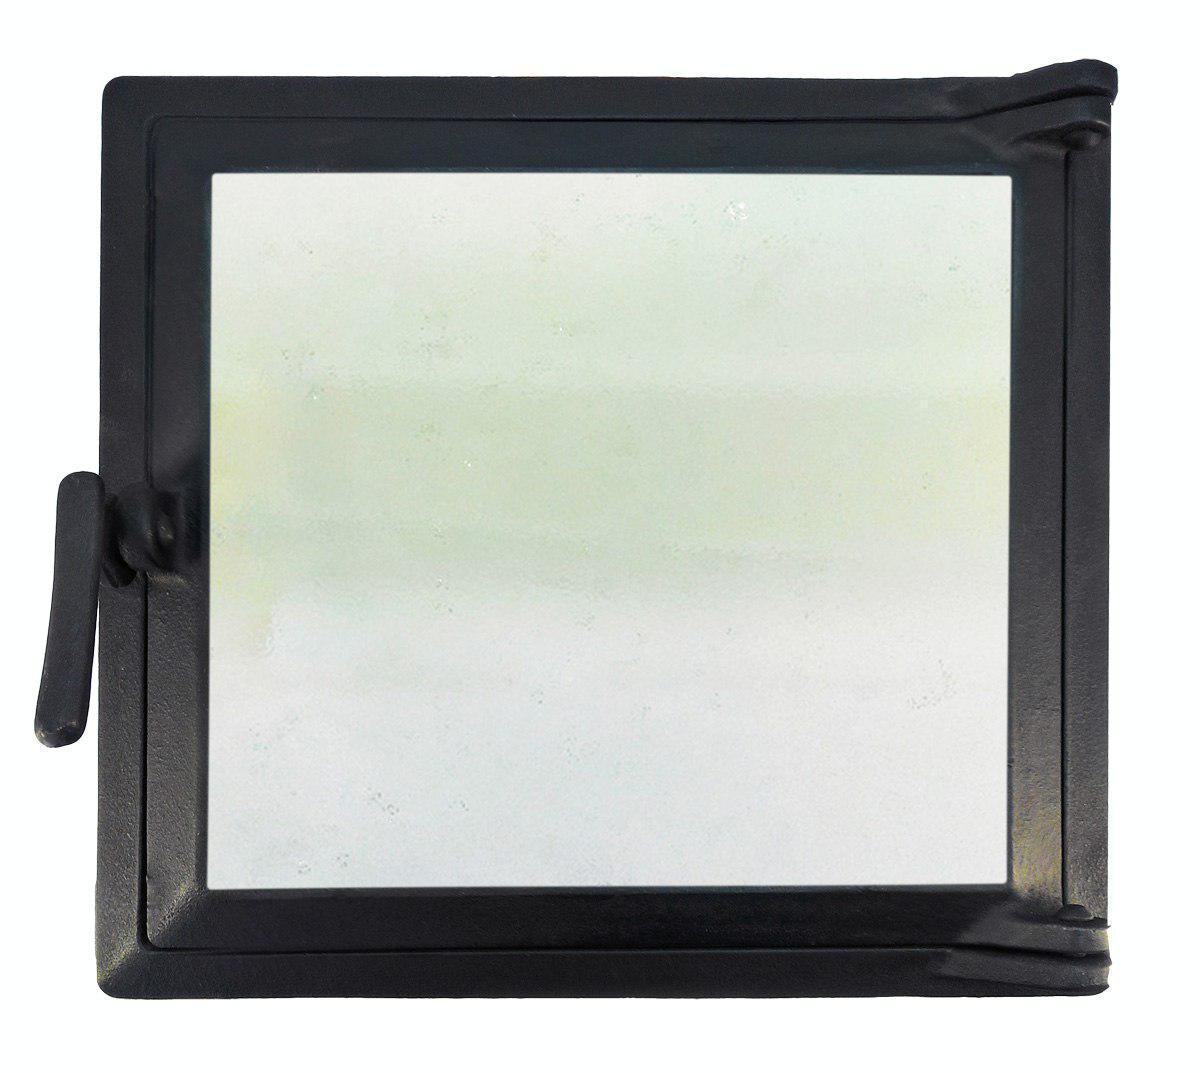 Топочная дверца для печи и камина со стеклом 290х320 мм, чугунная печная, каминная дверка 102864